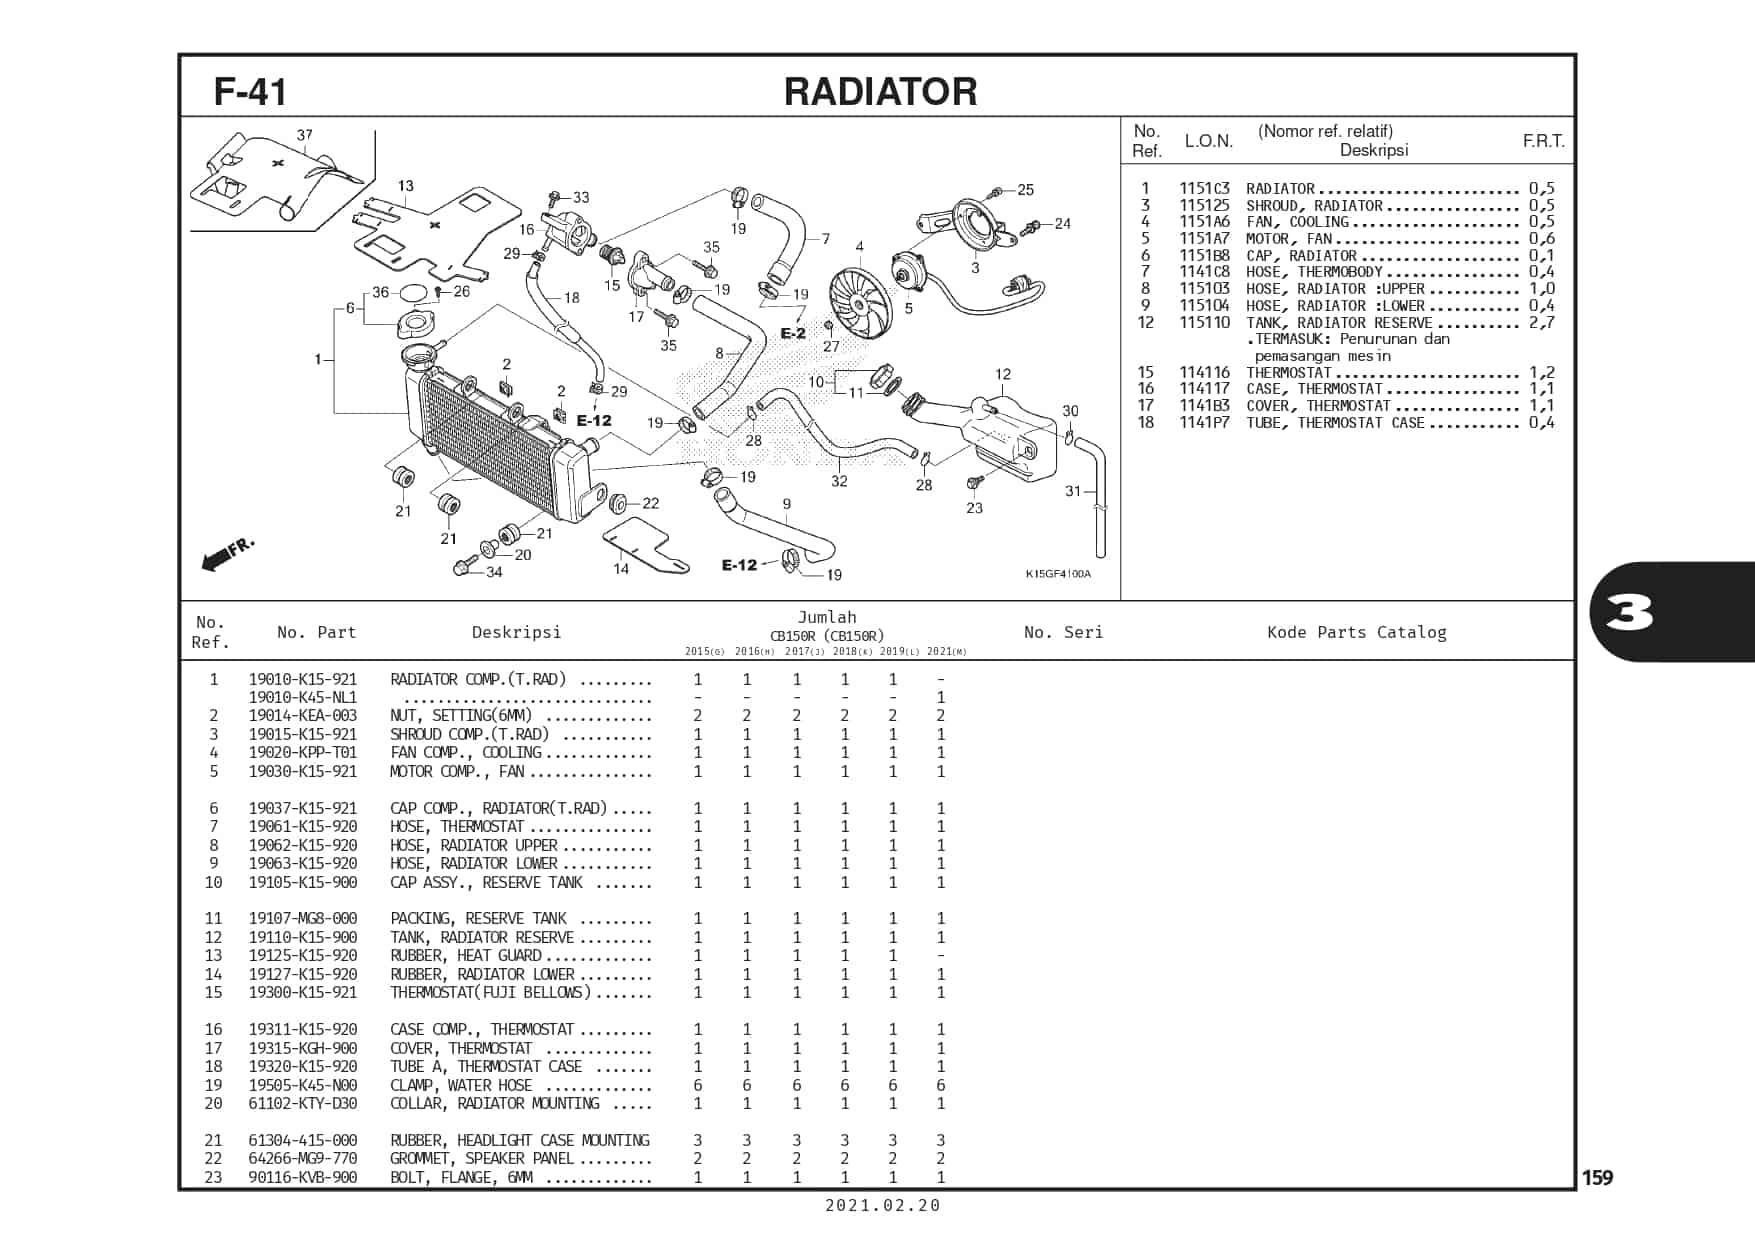 F-41 Radiator